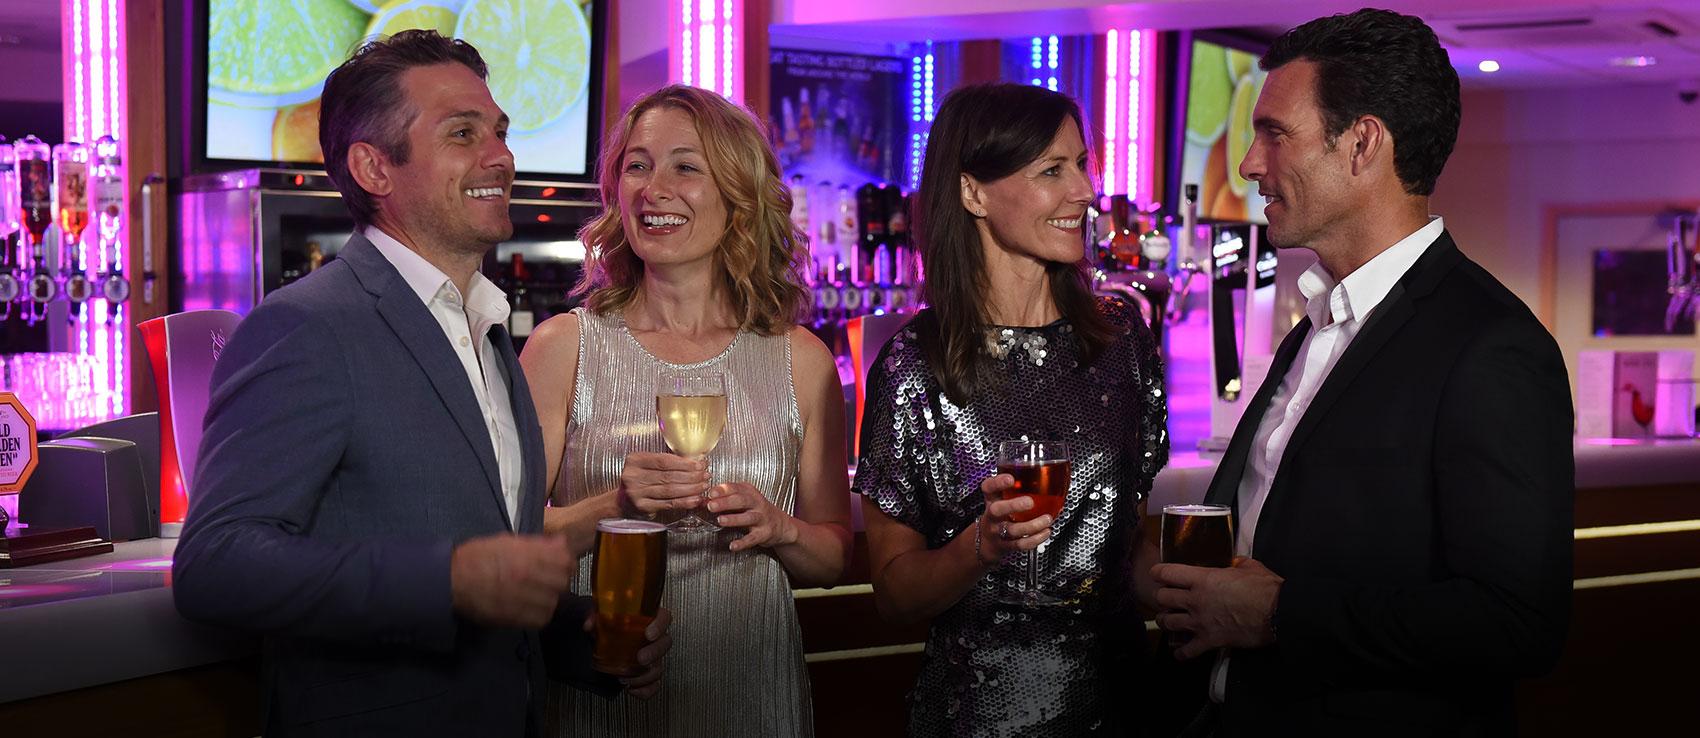 Group drinking at the Atlas Bar